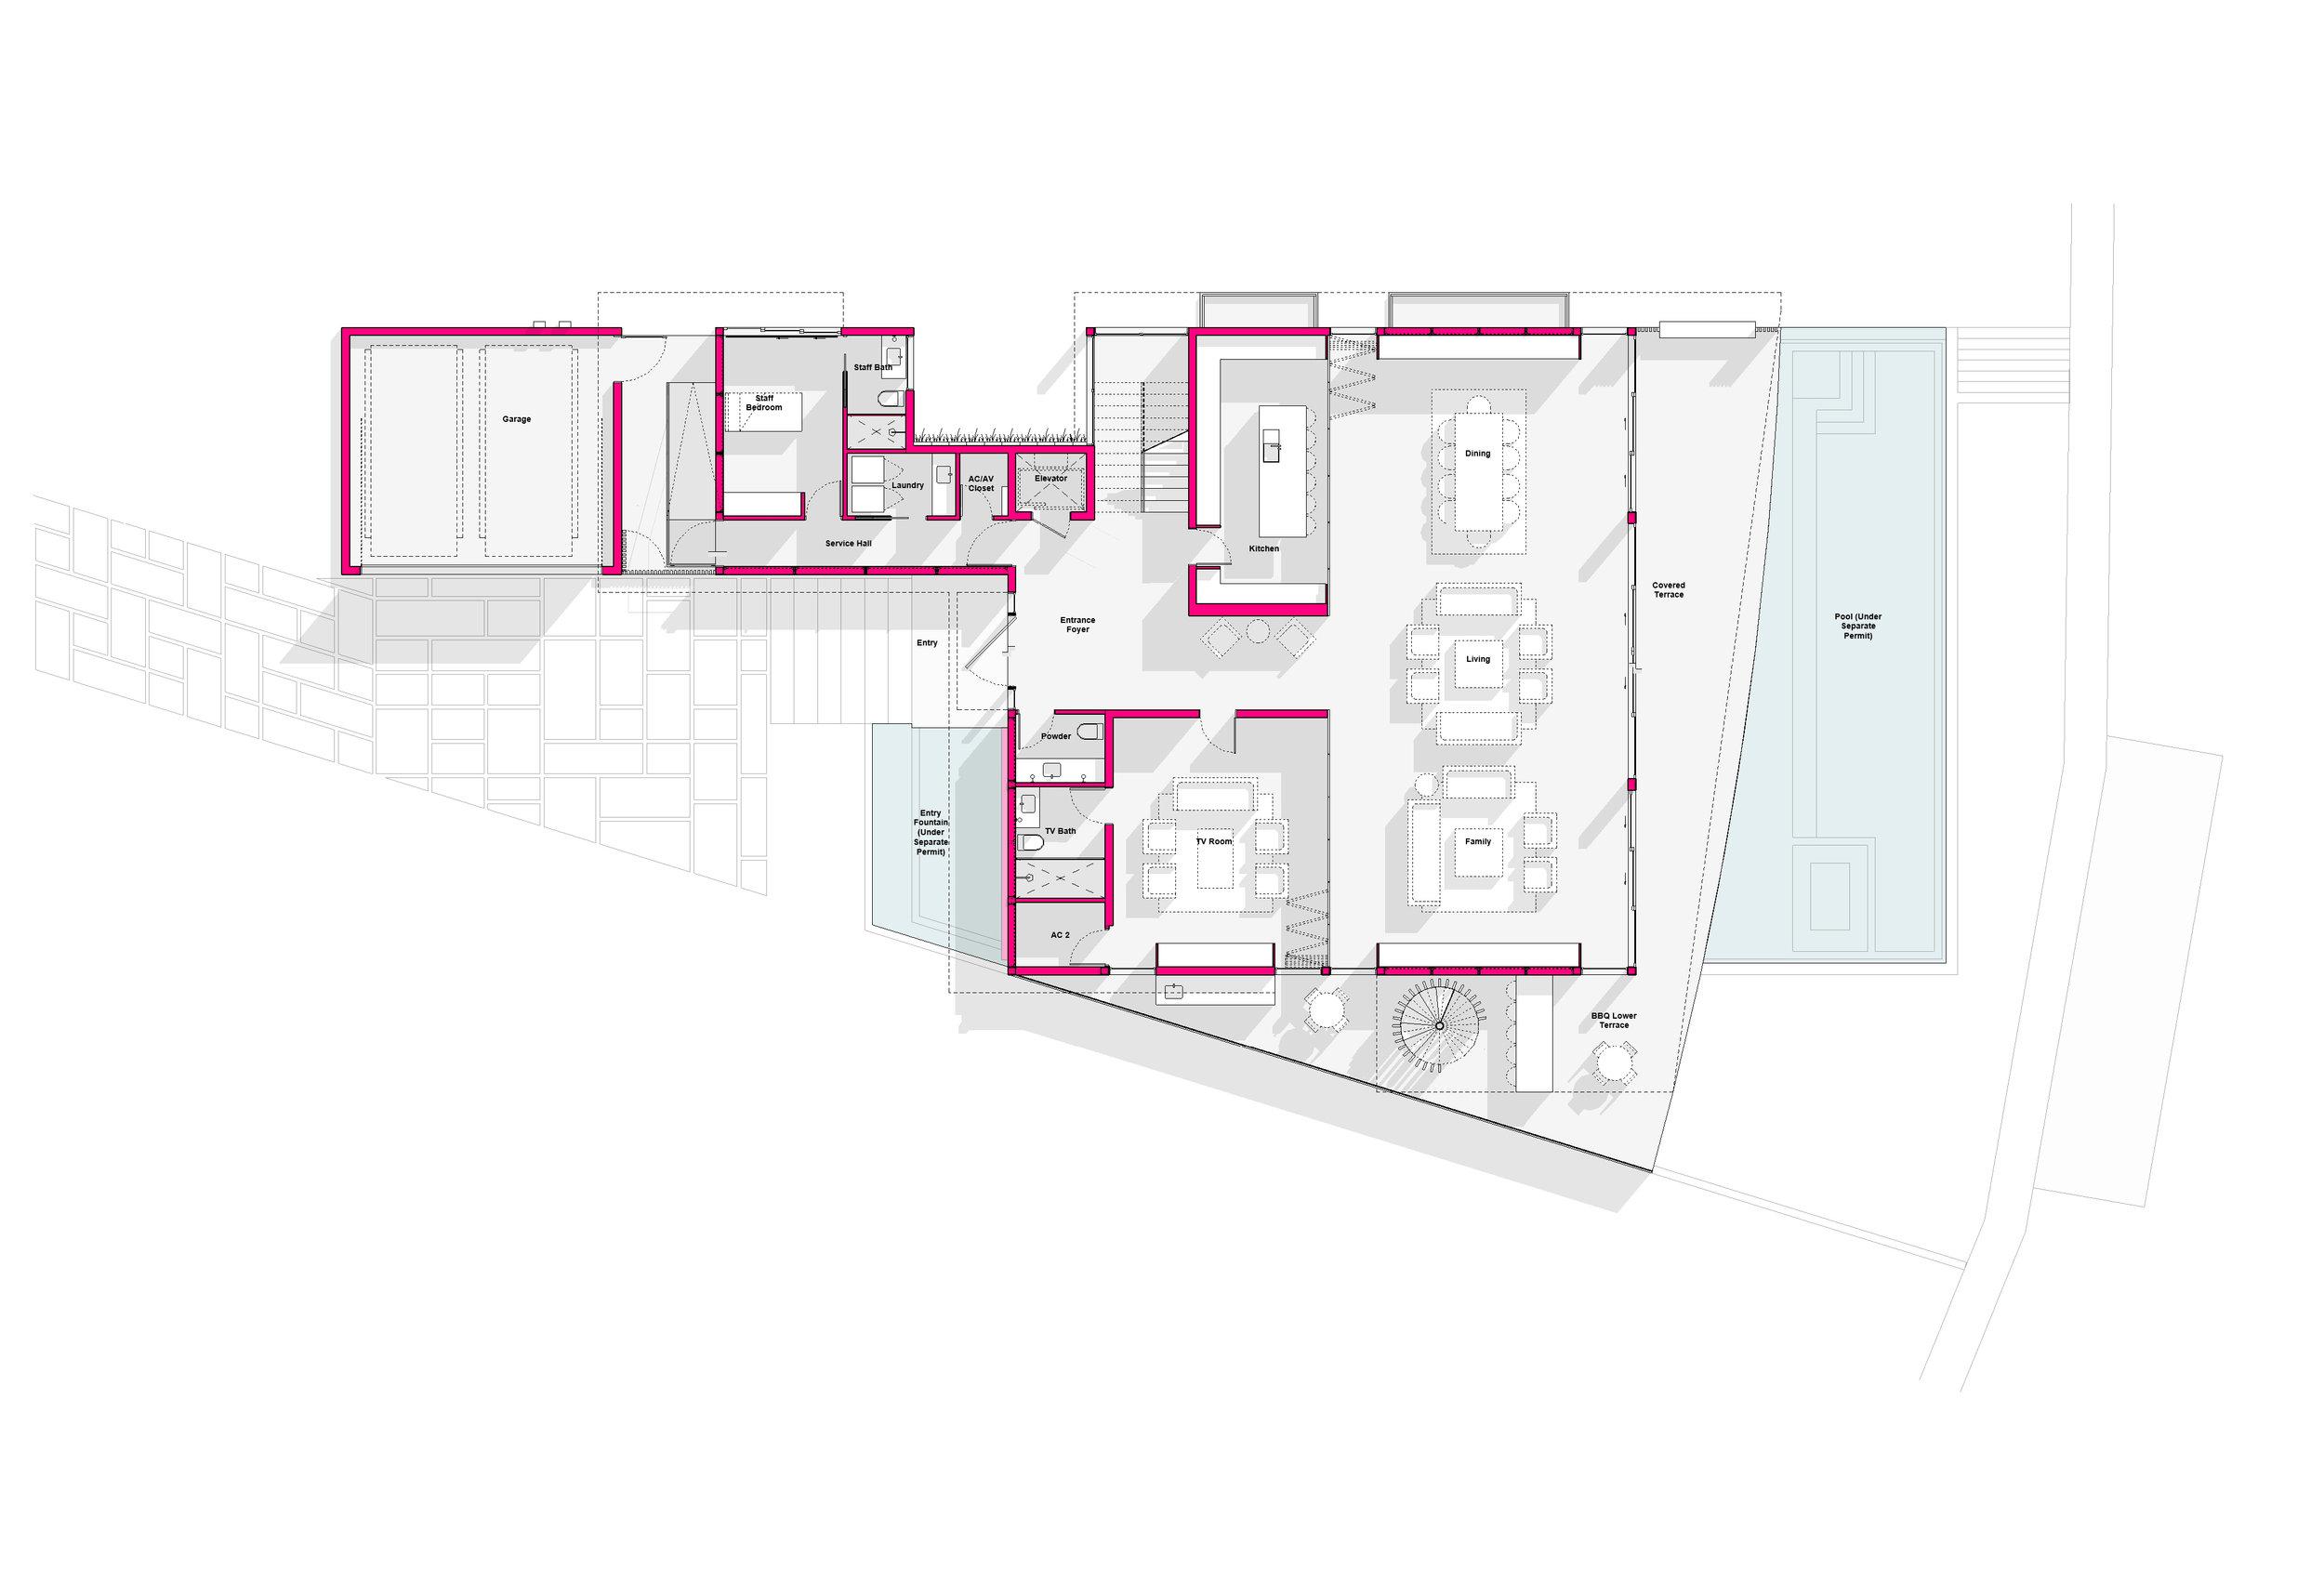 SAN MARINO - Sheet - X1 - First Floor Plan.jpg